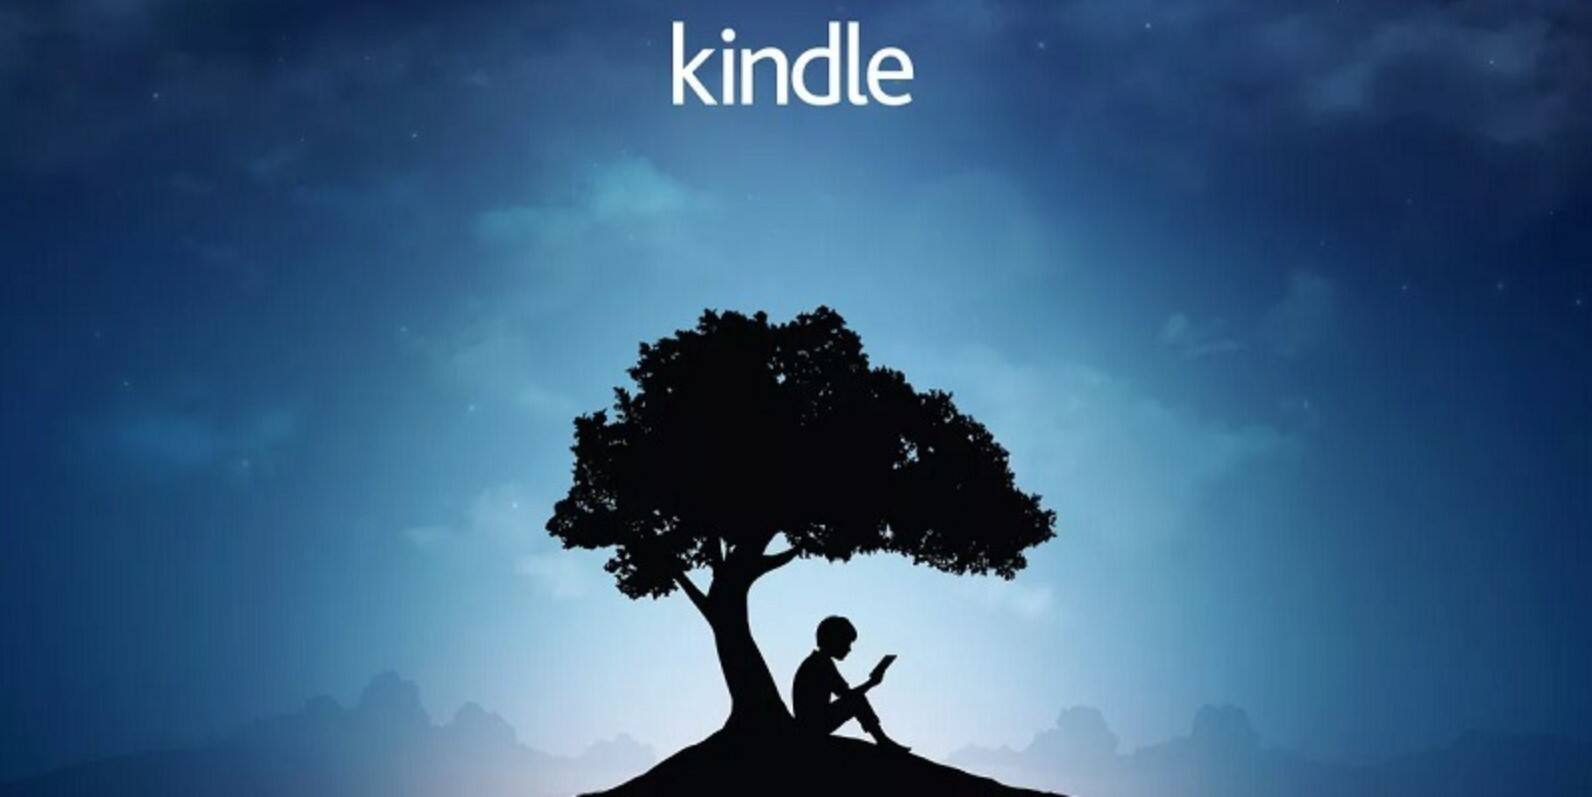 Amazon: FREE Kindle eBook Downloads